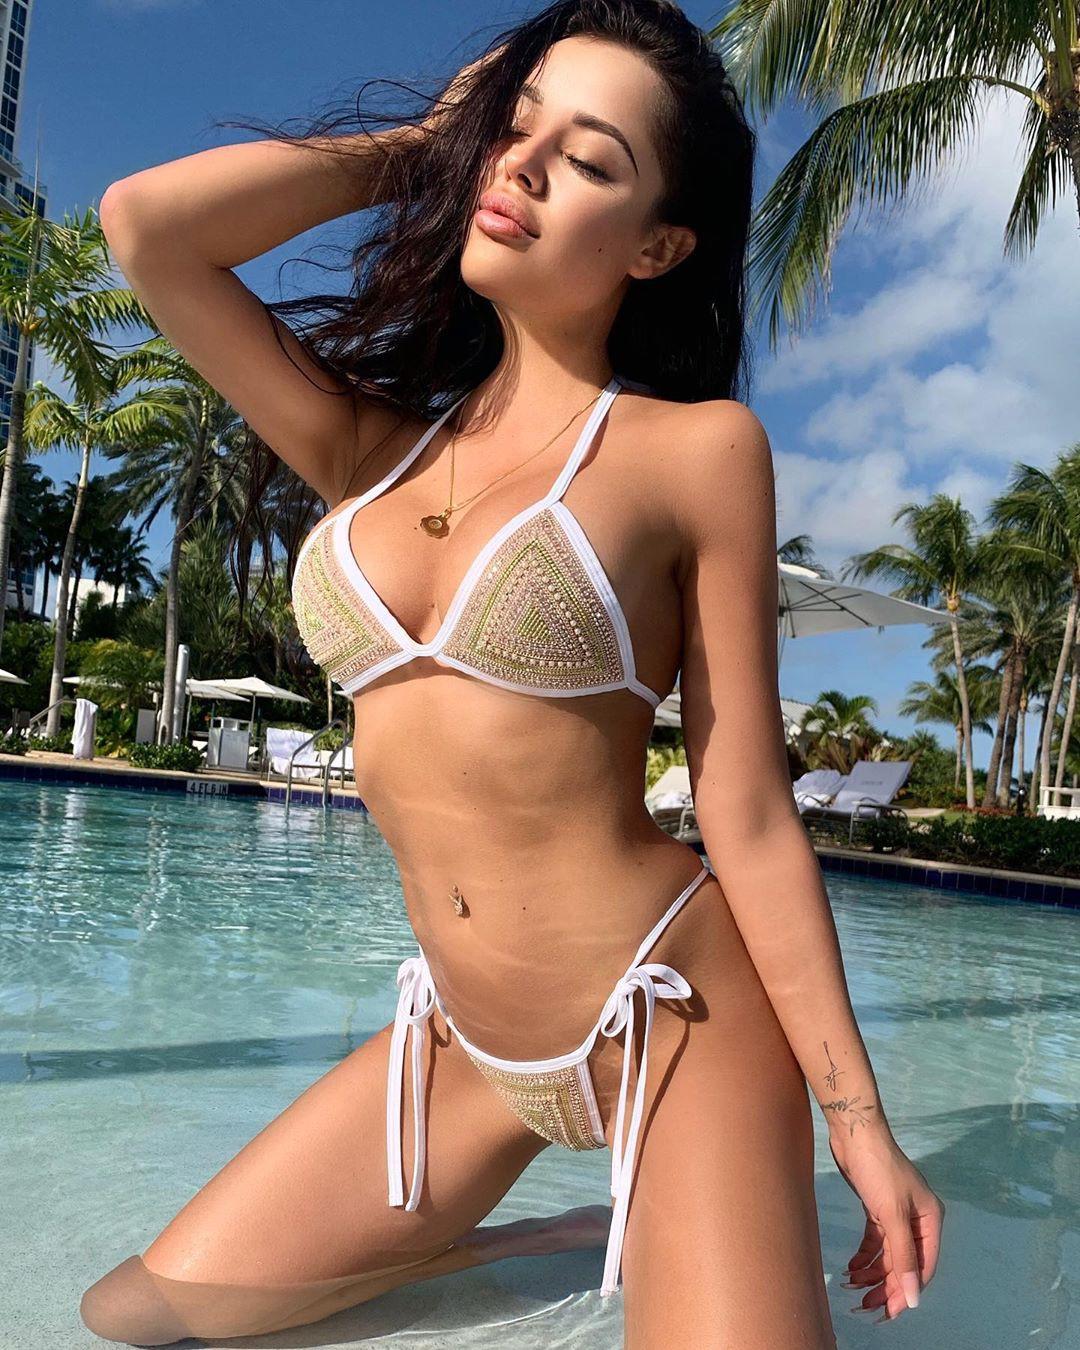 Playmate Kamila hot photo, hot lingerie model, sexy bikini models swimsuit top, swimwear colour  ...